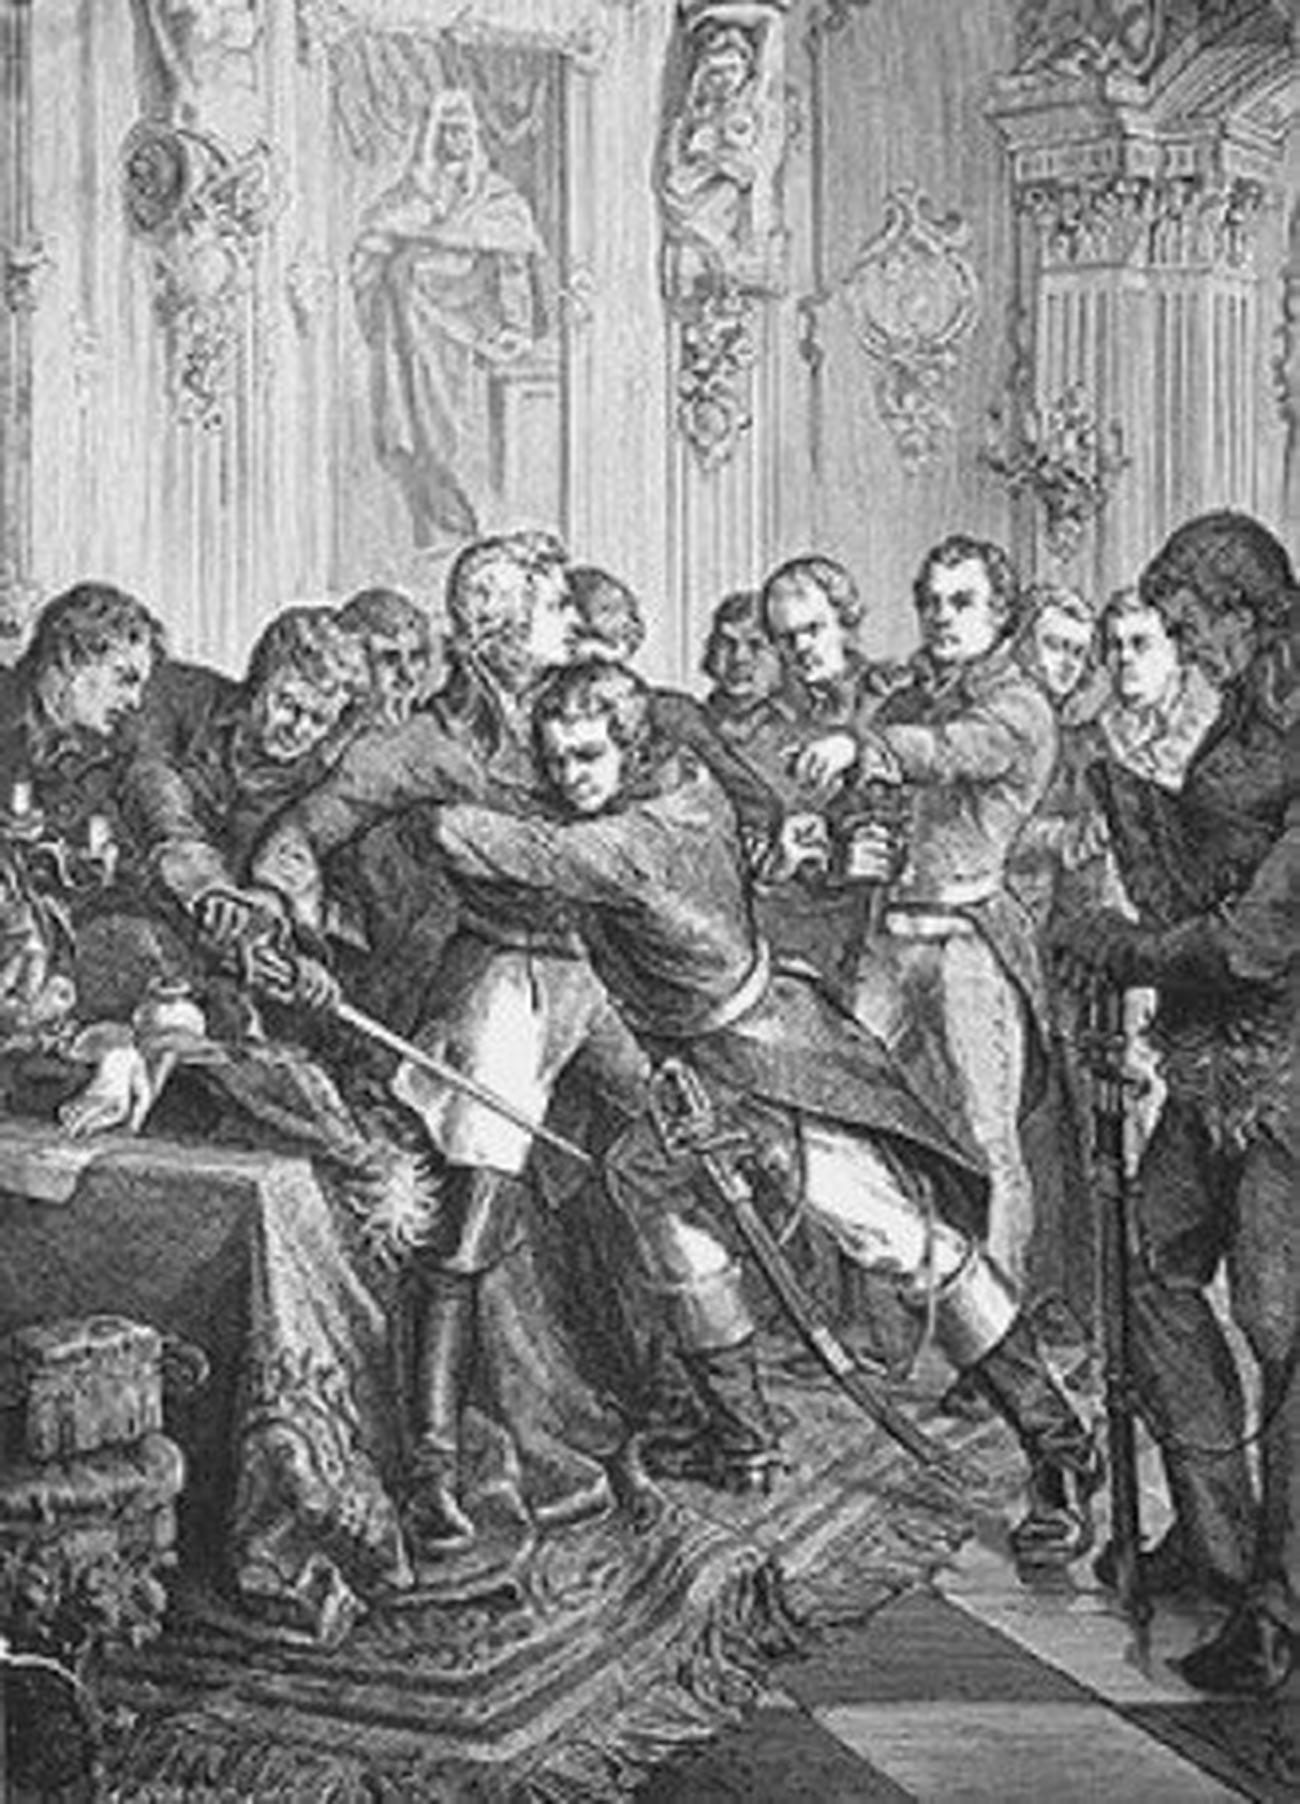 Arresto de Gustavo IV Adolfo.